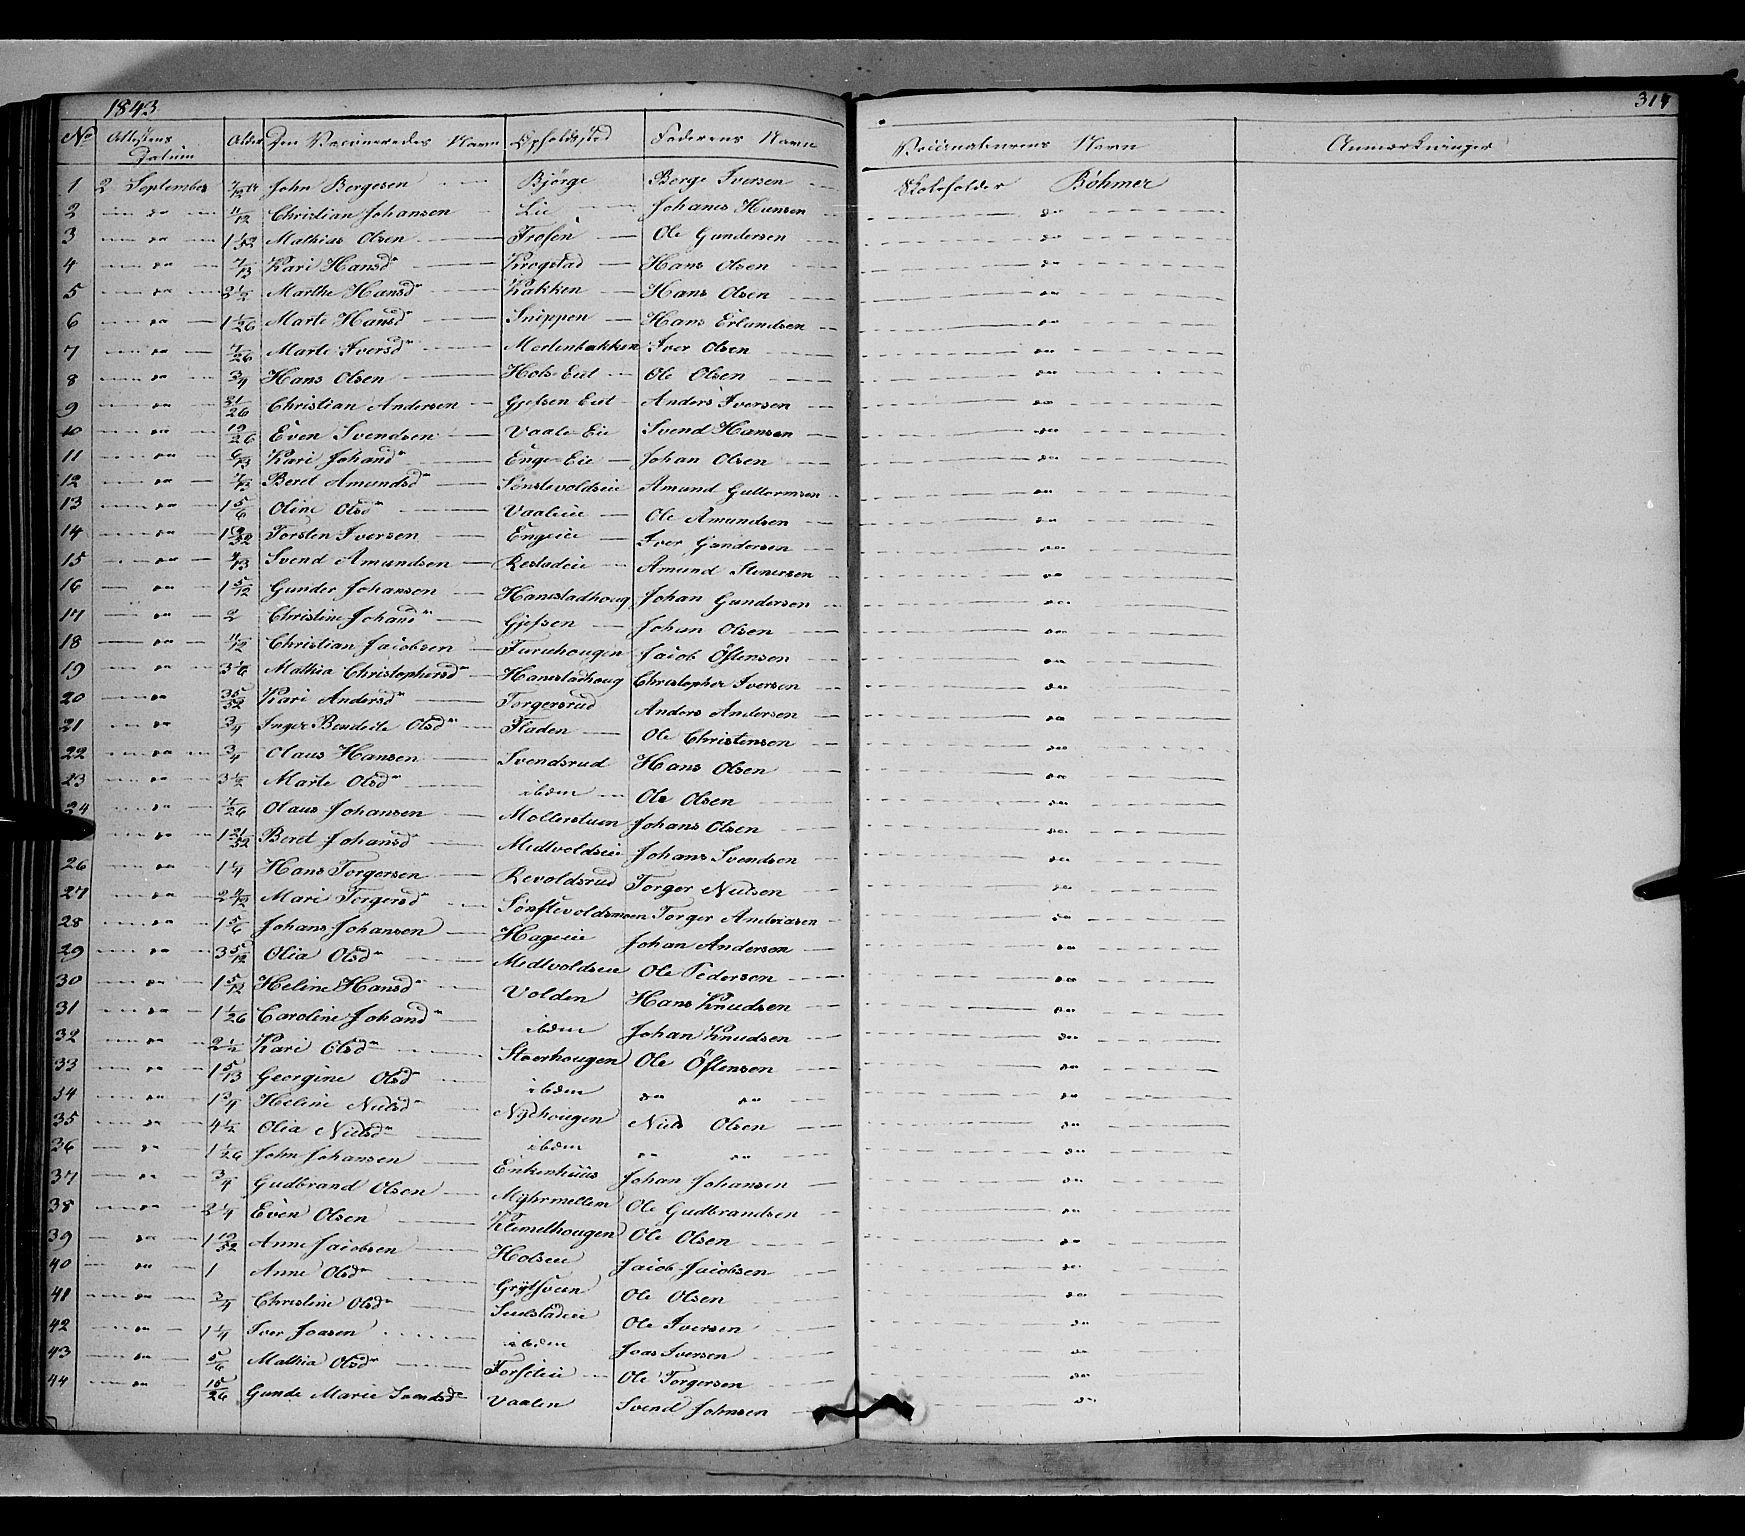 SAH, Gausdal prestekontor, Ministerialbok nr. 7, 1840-1850, s. 314